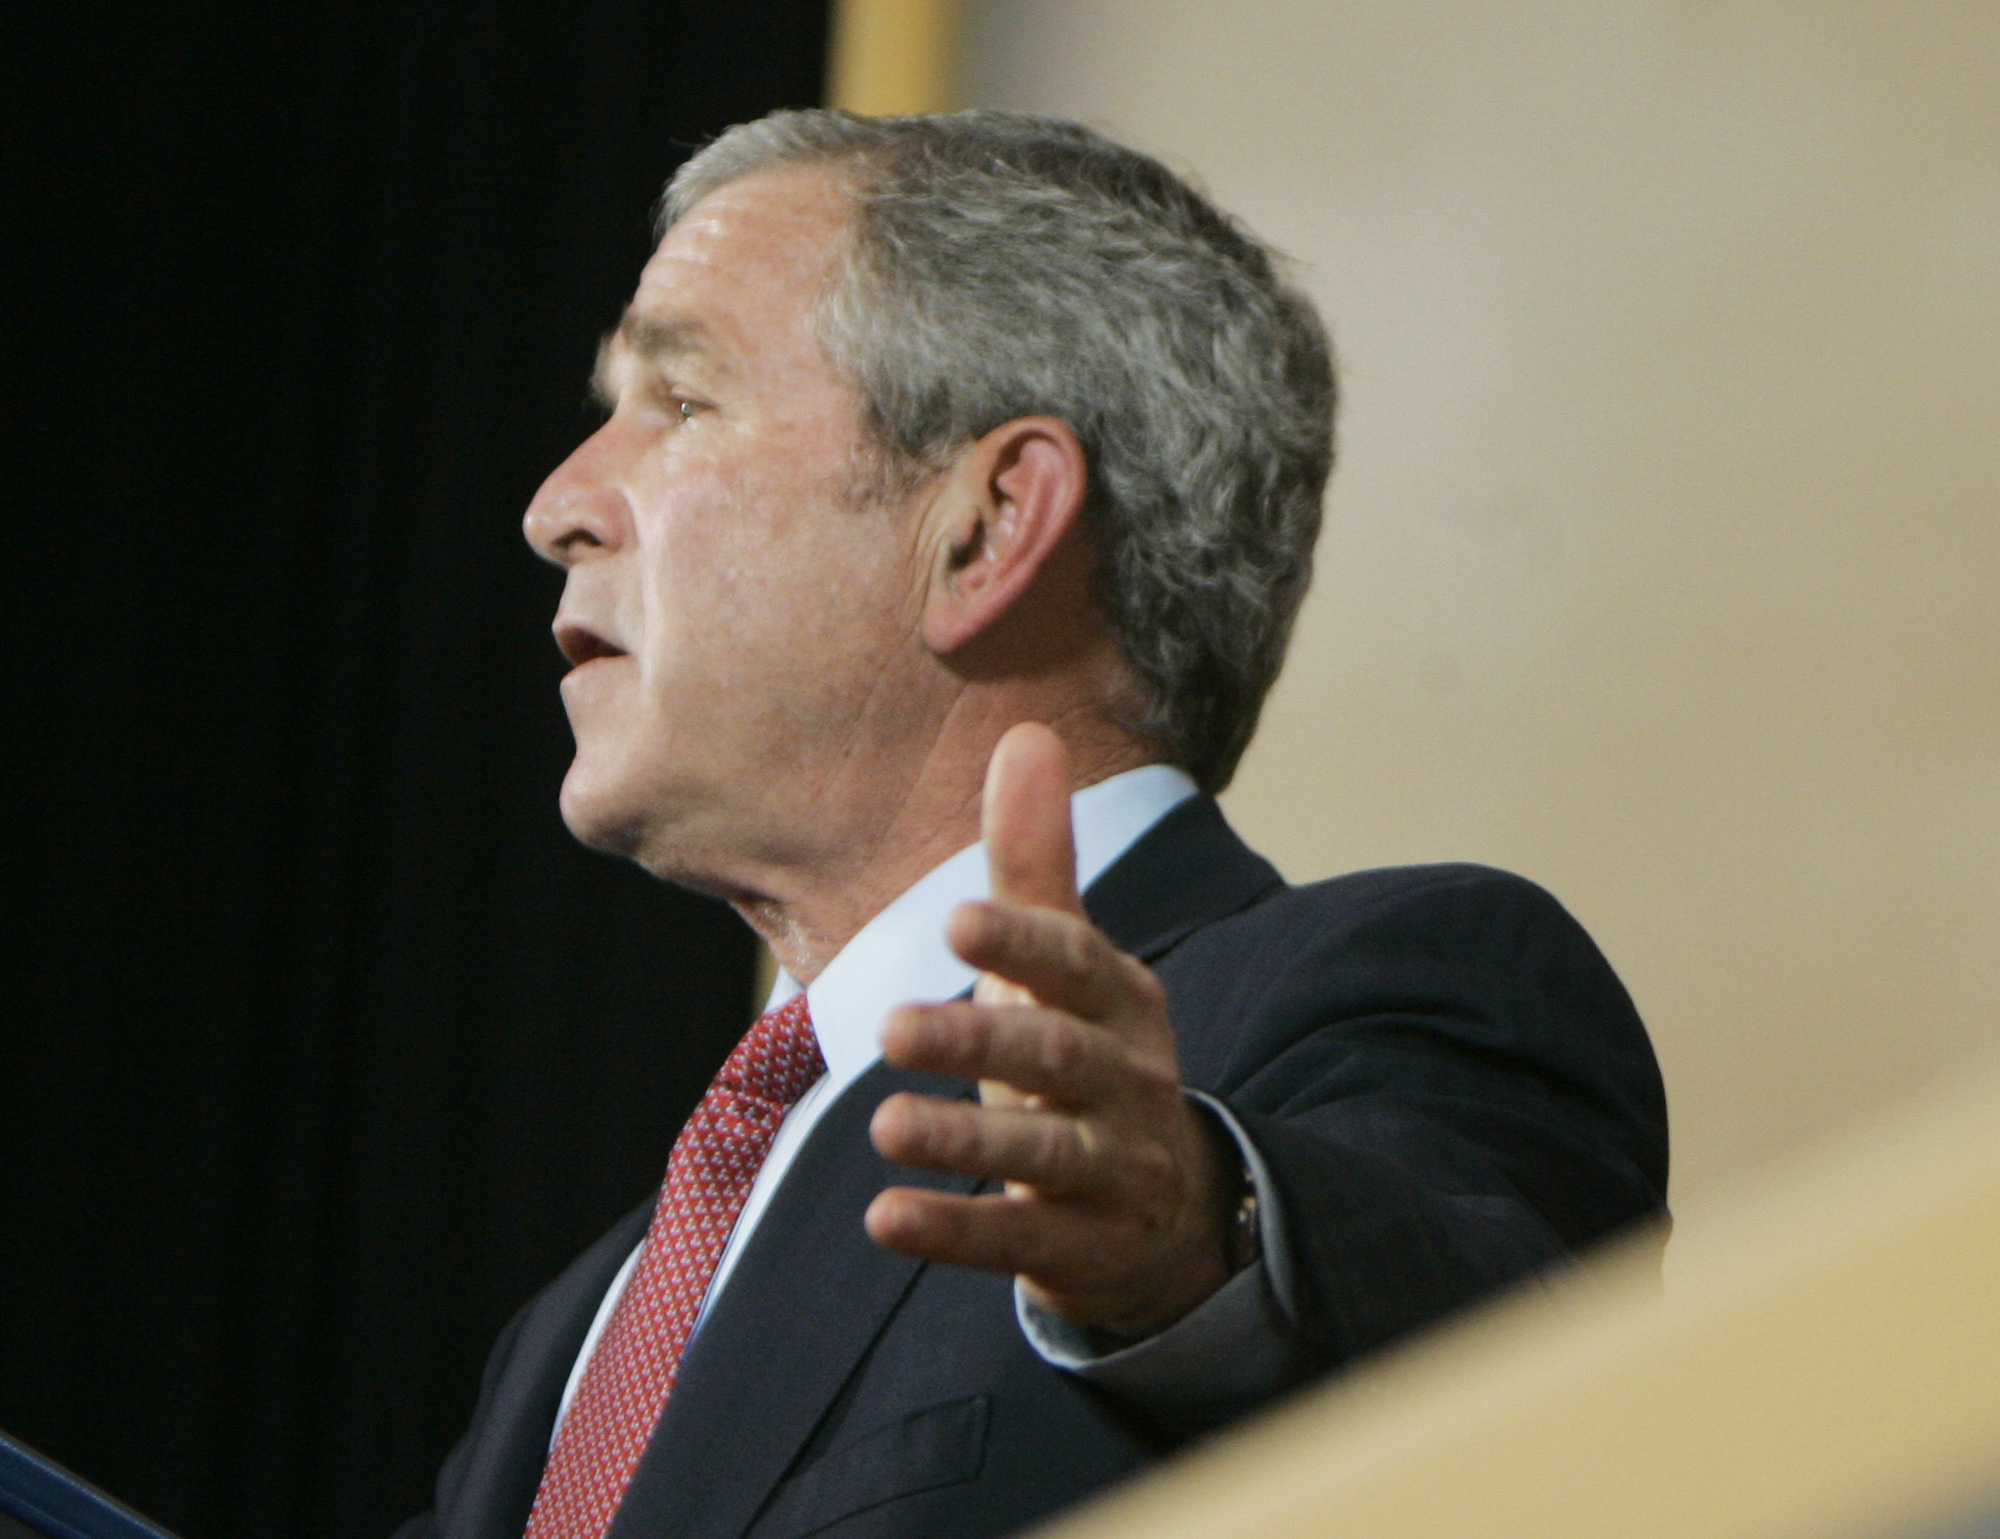 Die Rhetorik des Mr. Bush